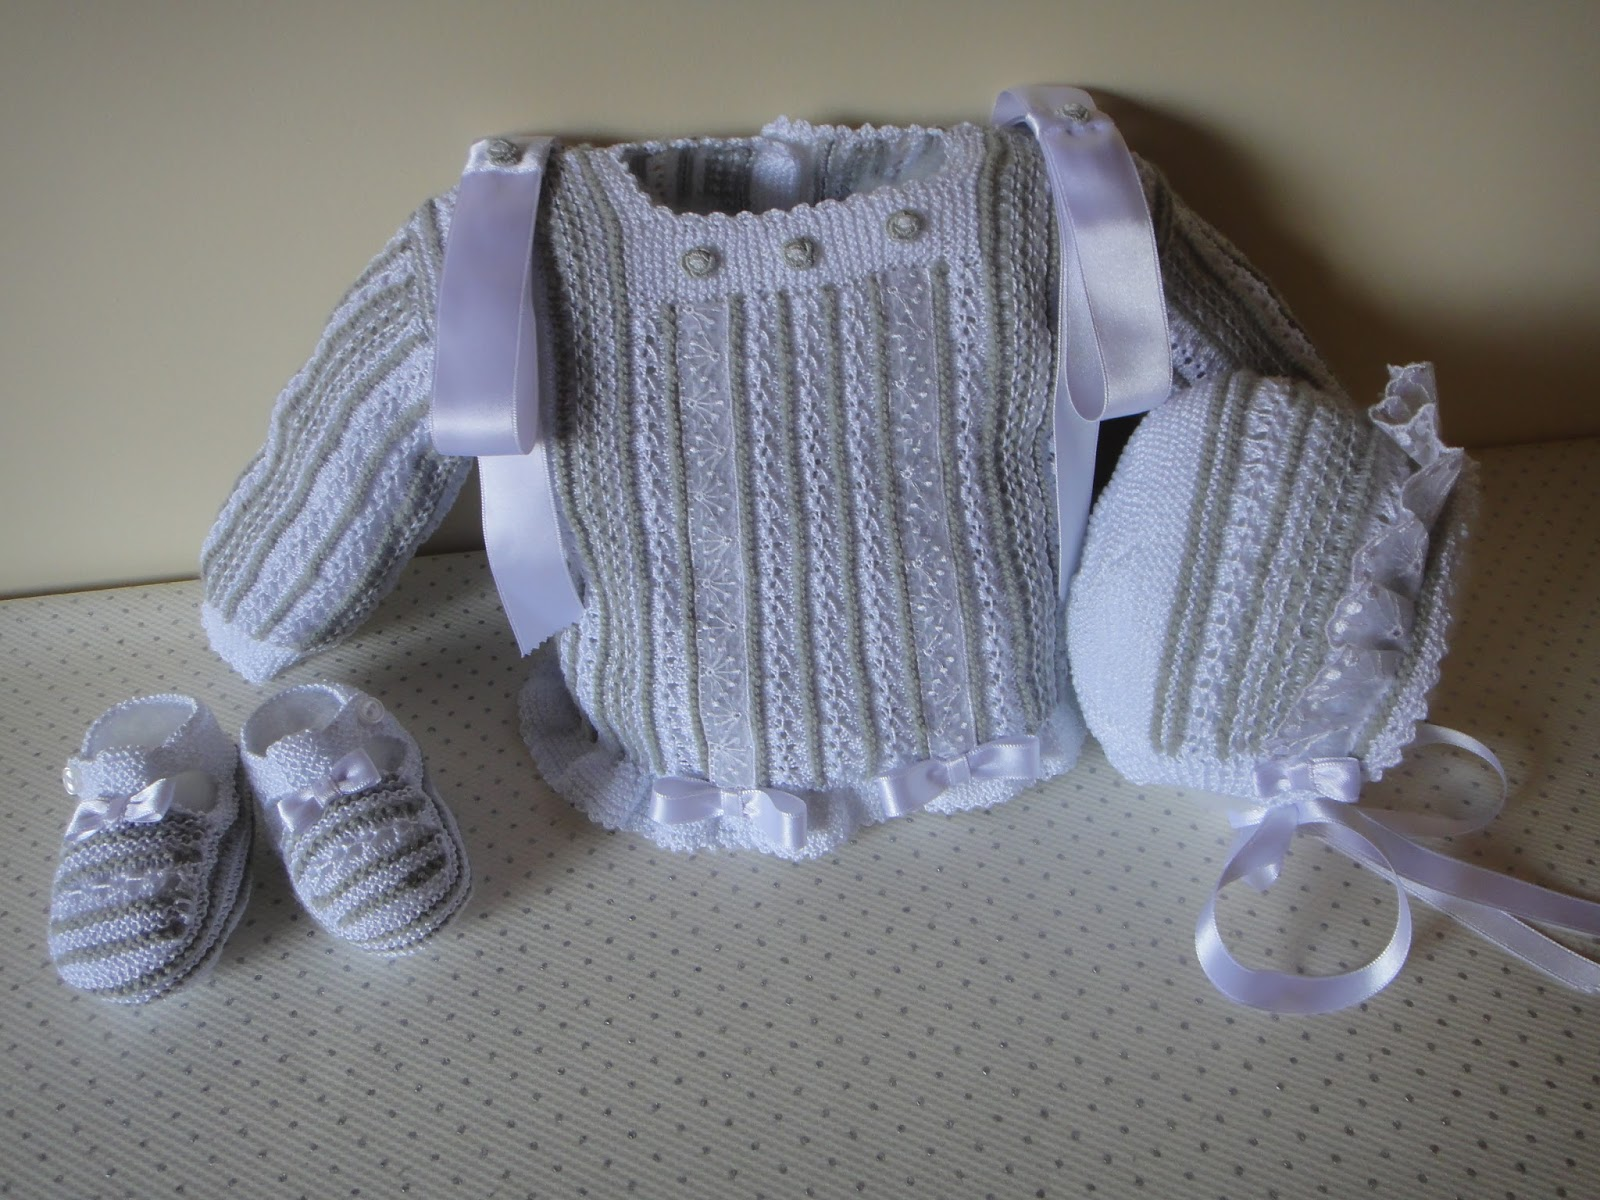 viagra uterine lining